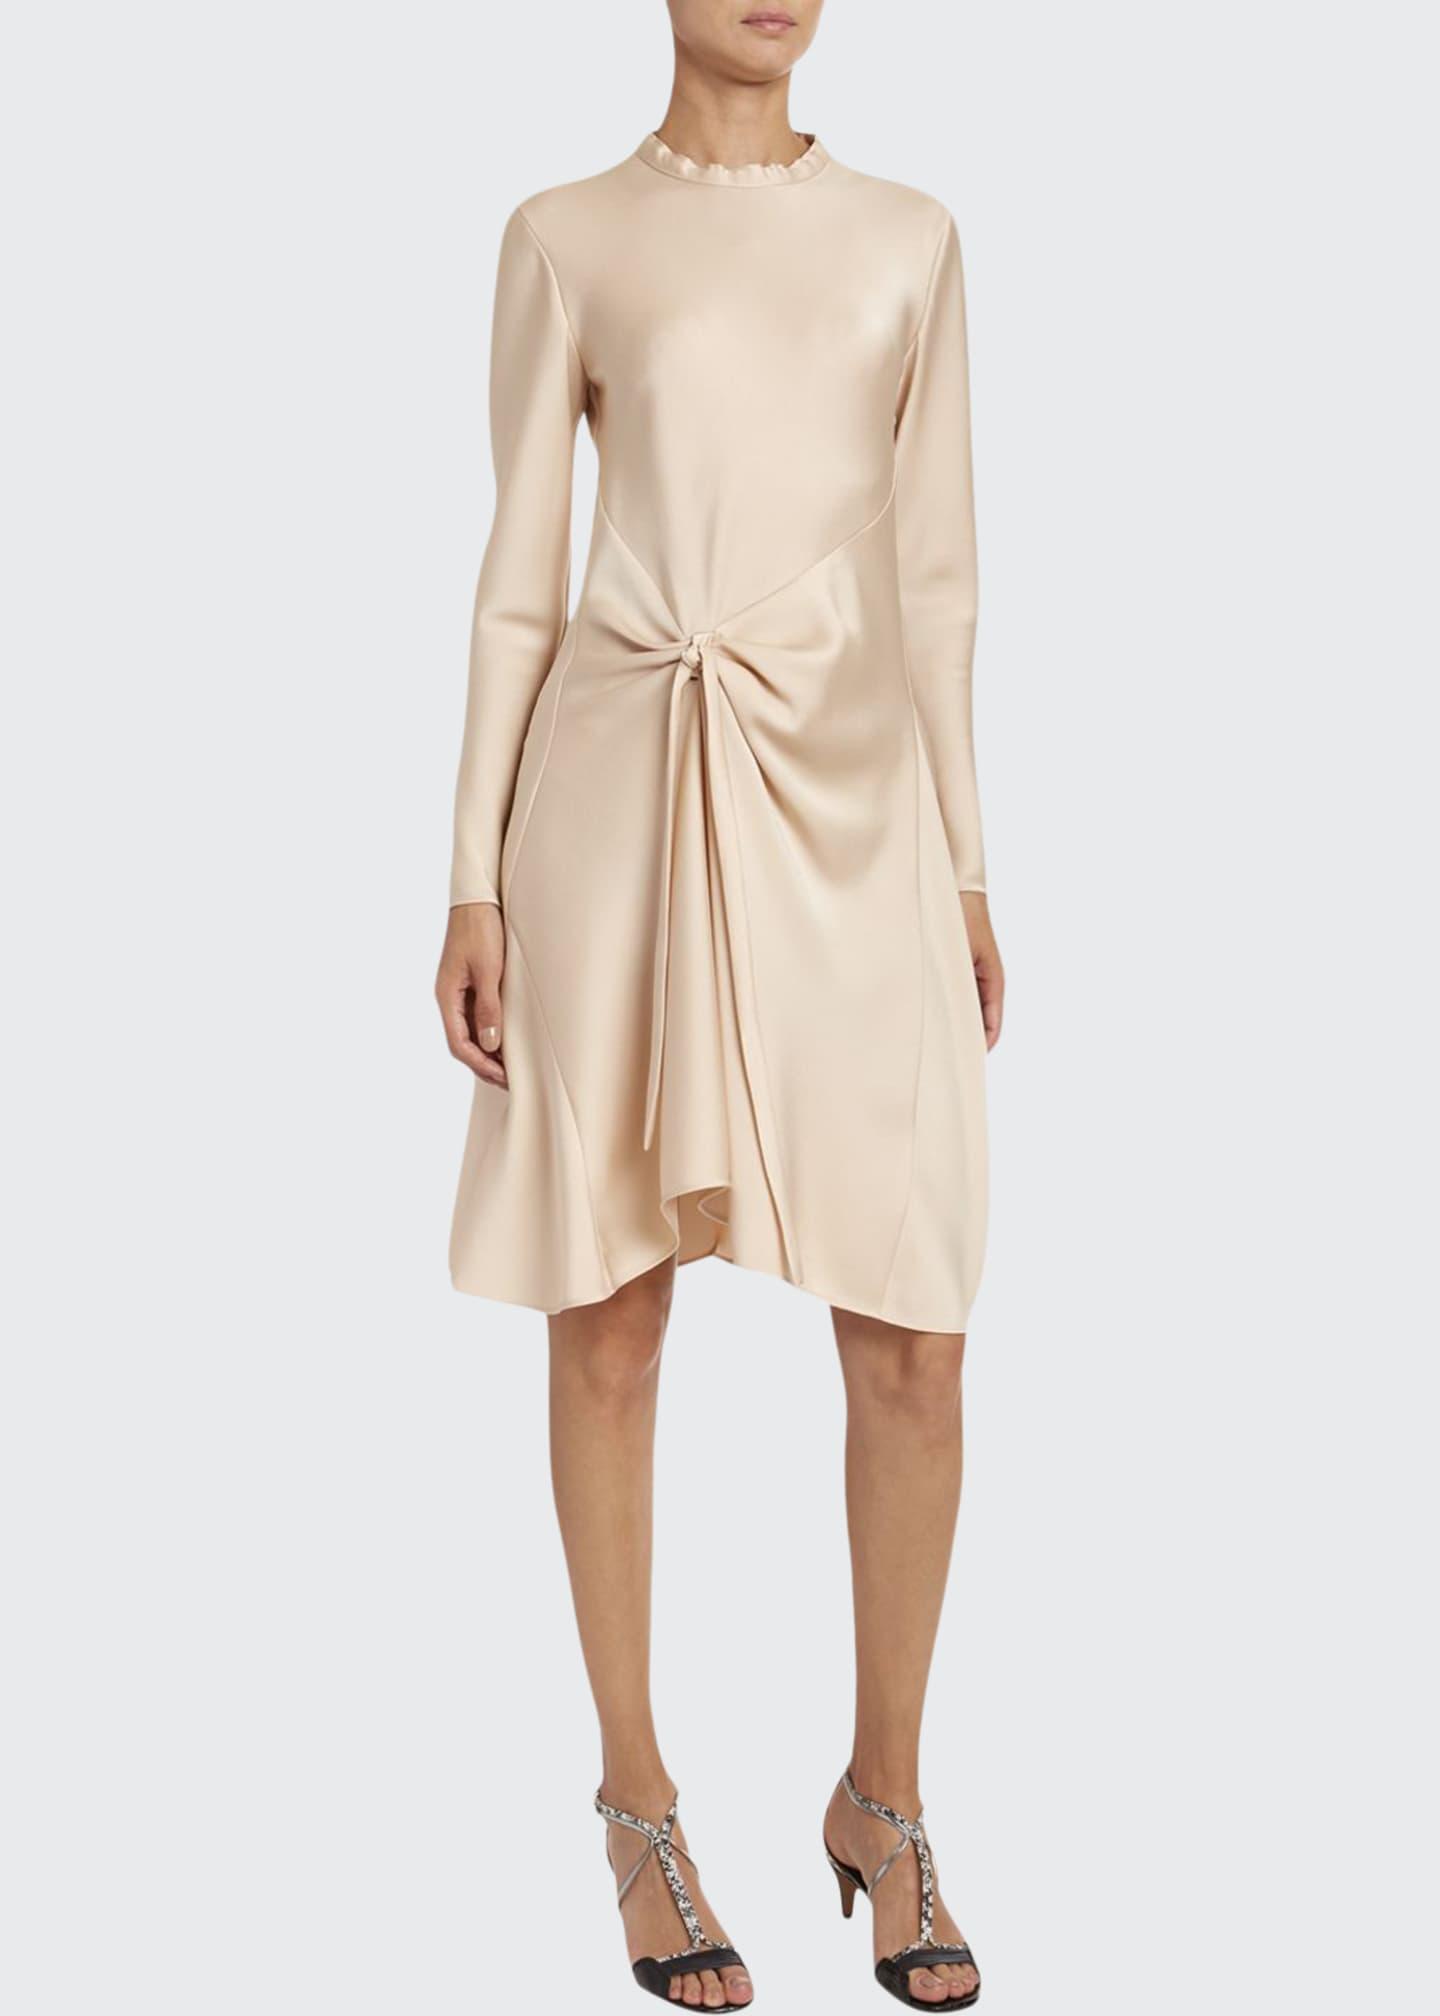 Chloe Fluid Satin Ruched-Side Dress